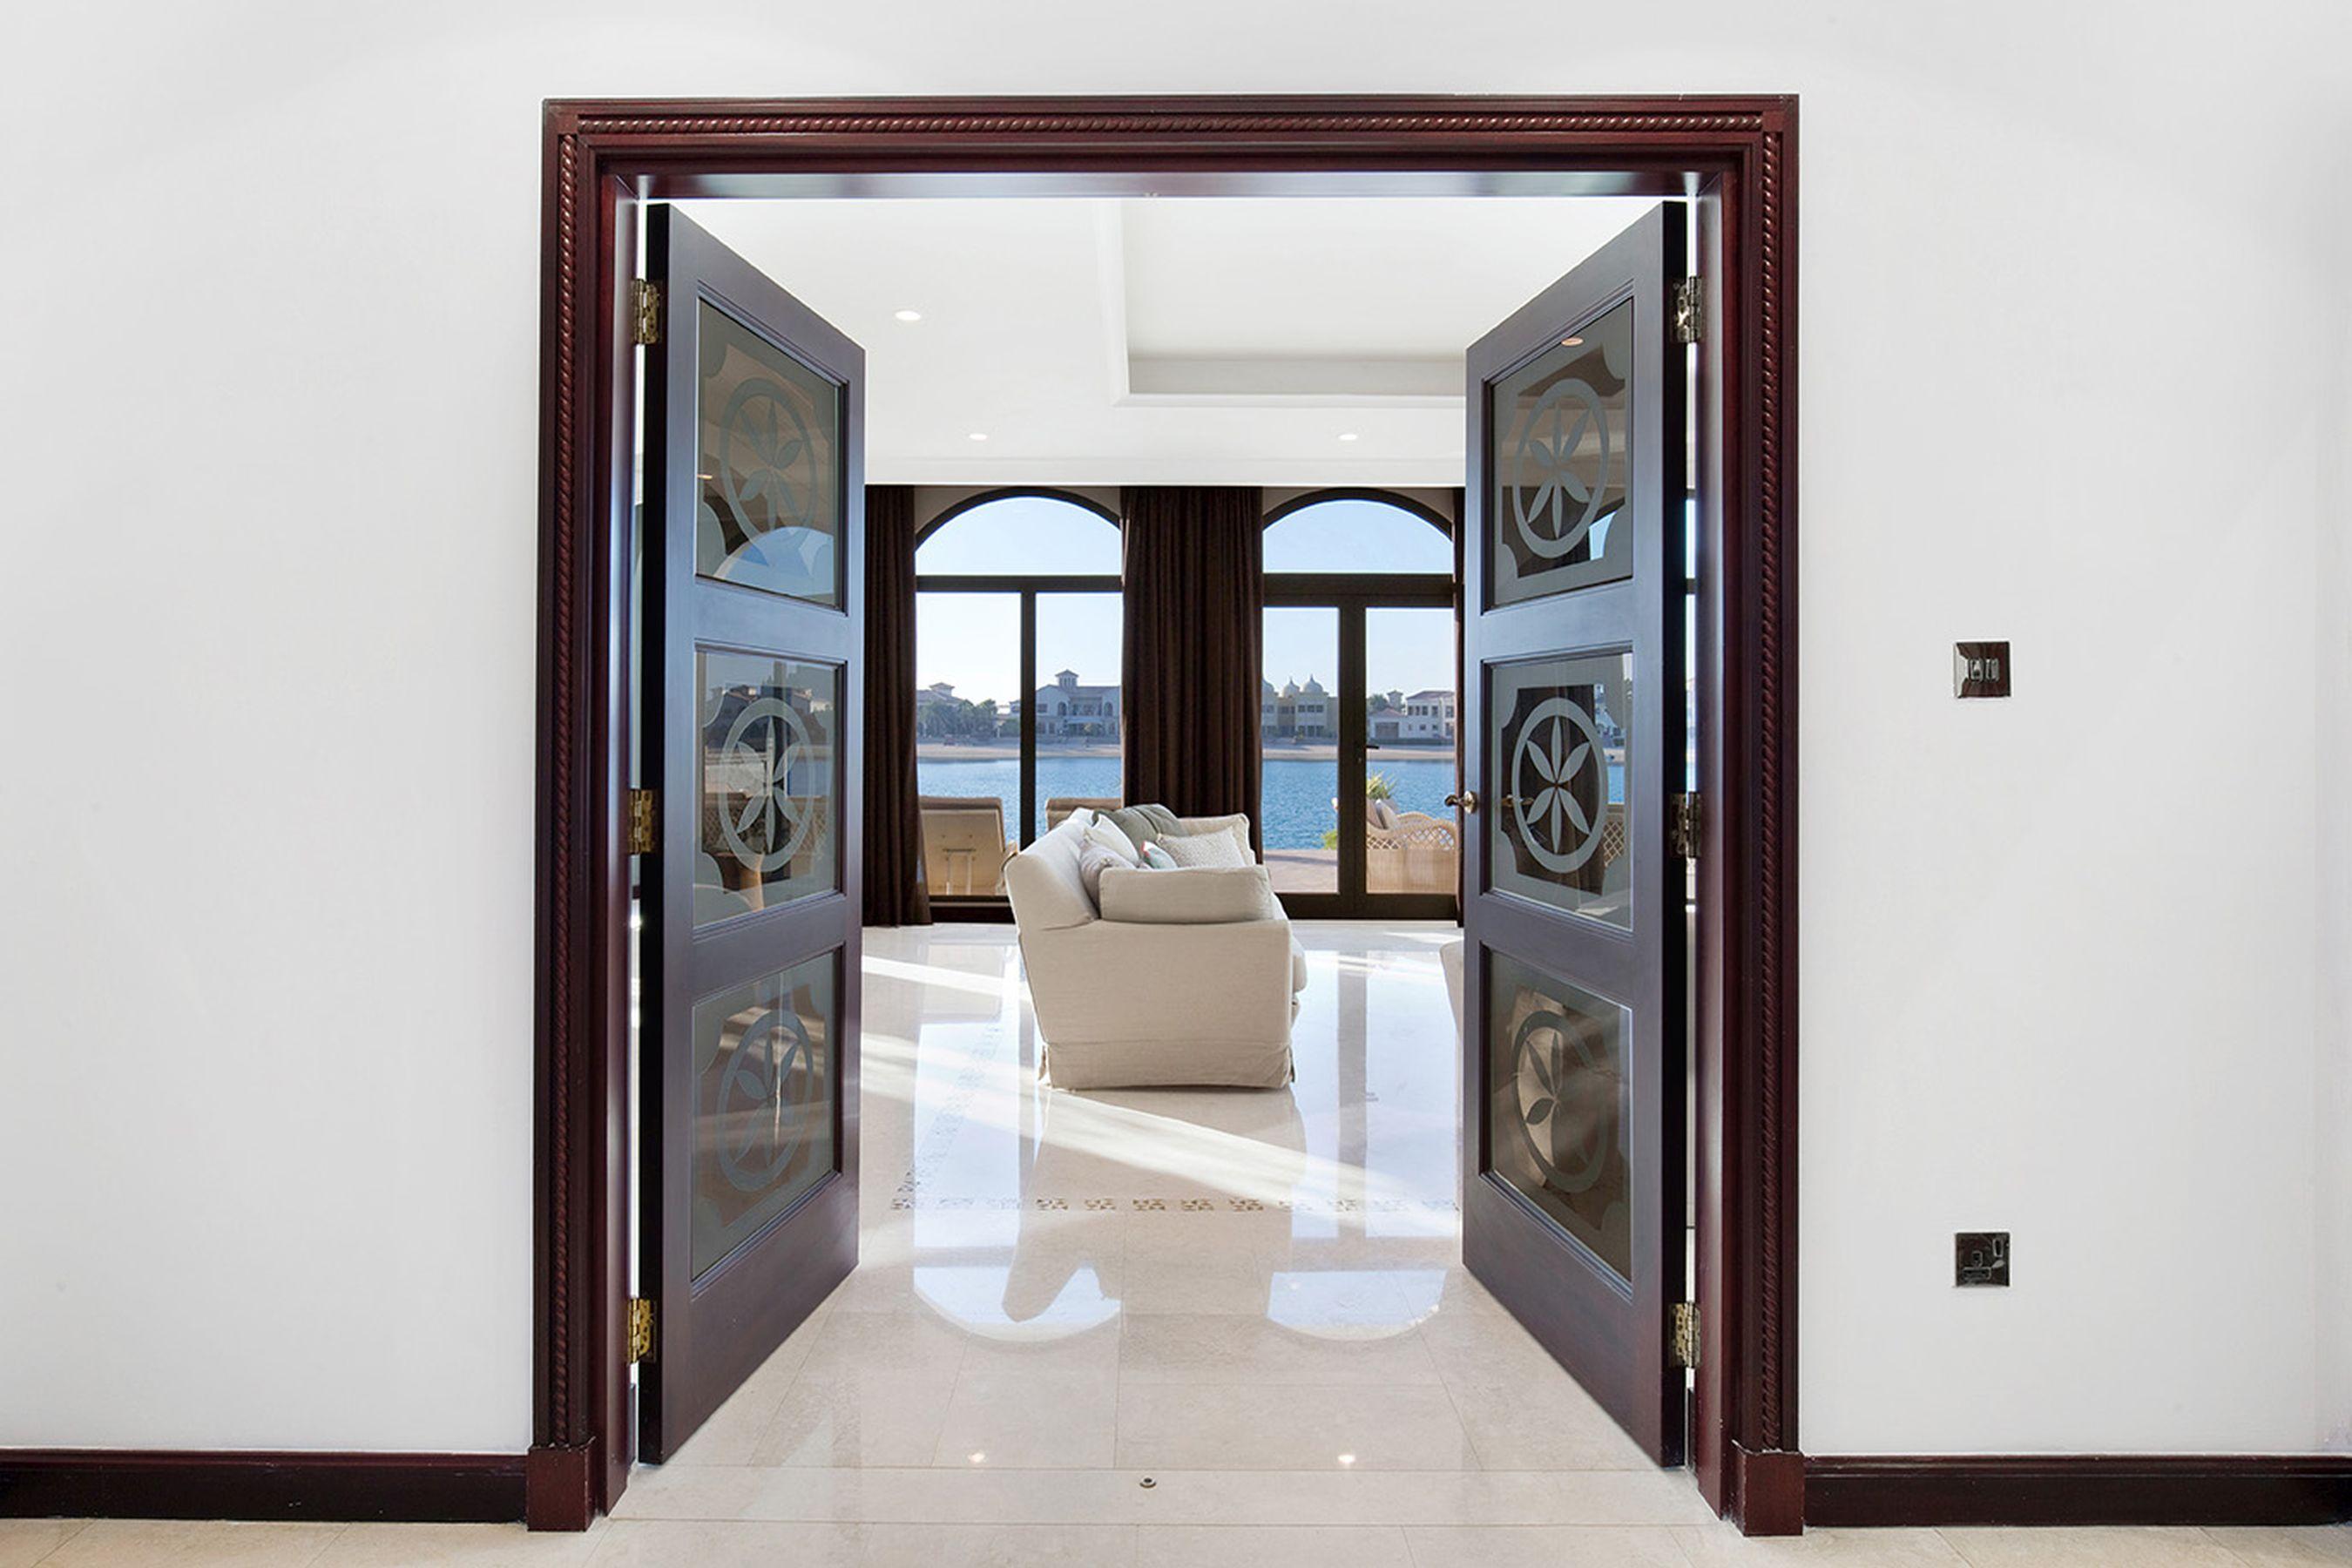 Stunning Atrium 4BR Villa  Atlantis View